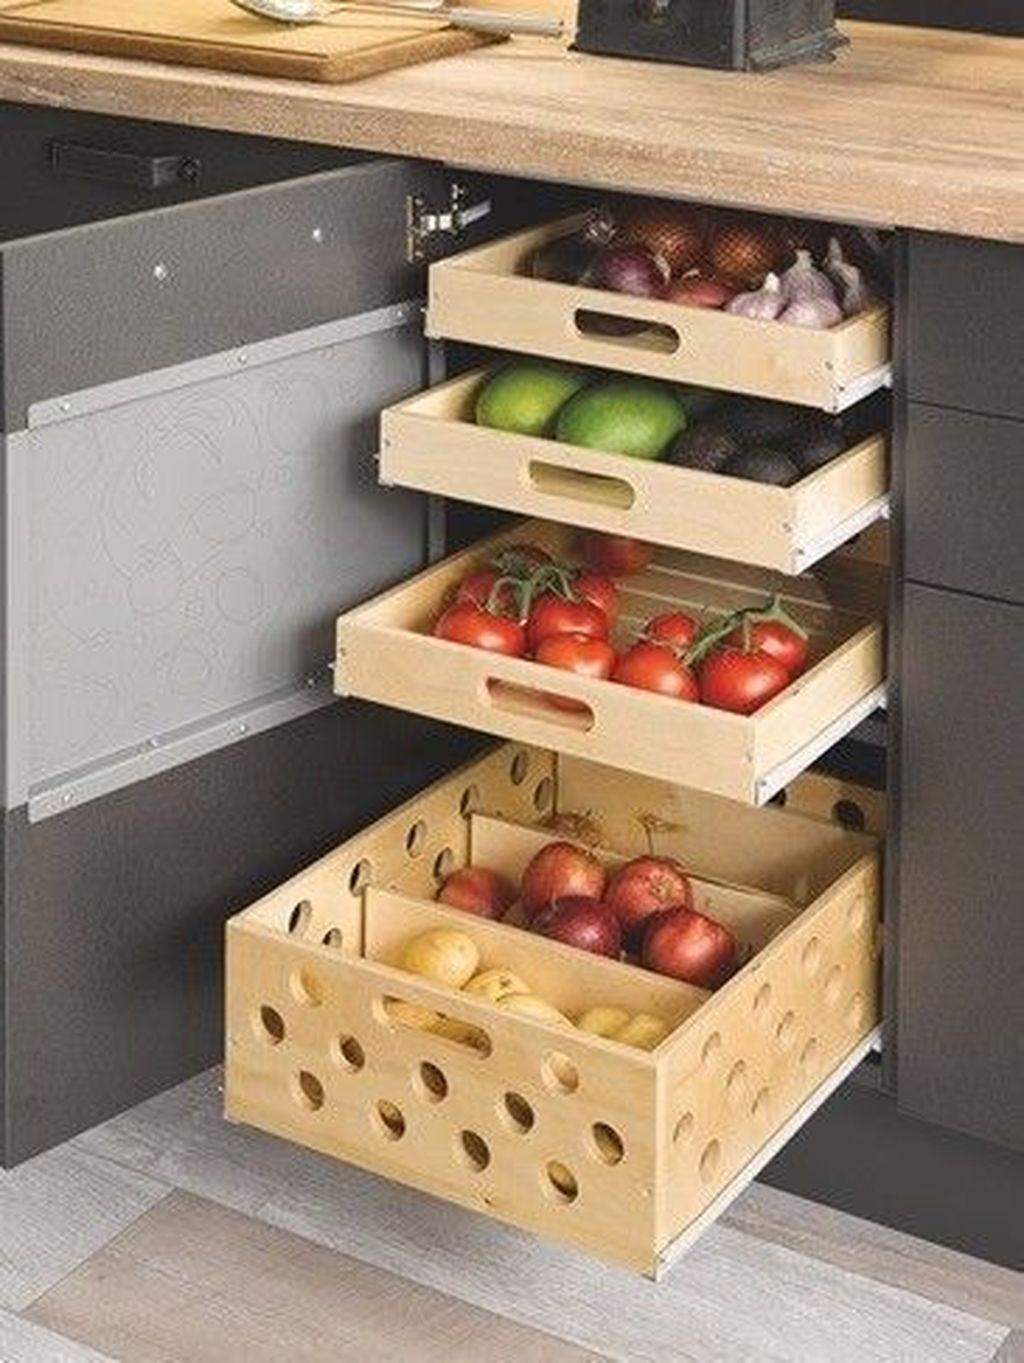 30+ Unimaginable DIY Ideas For Kitchen Storage